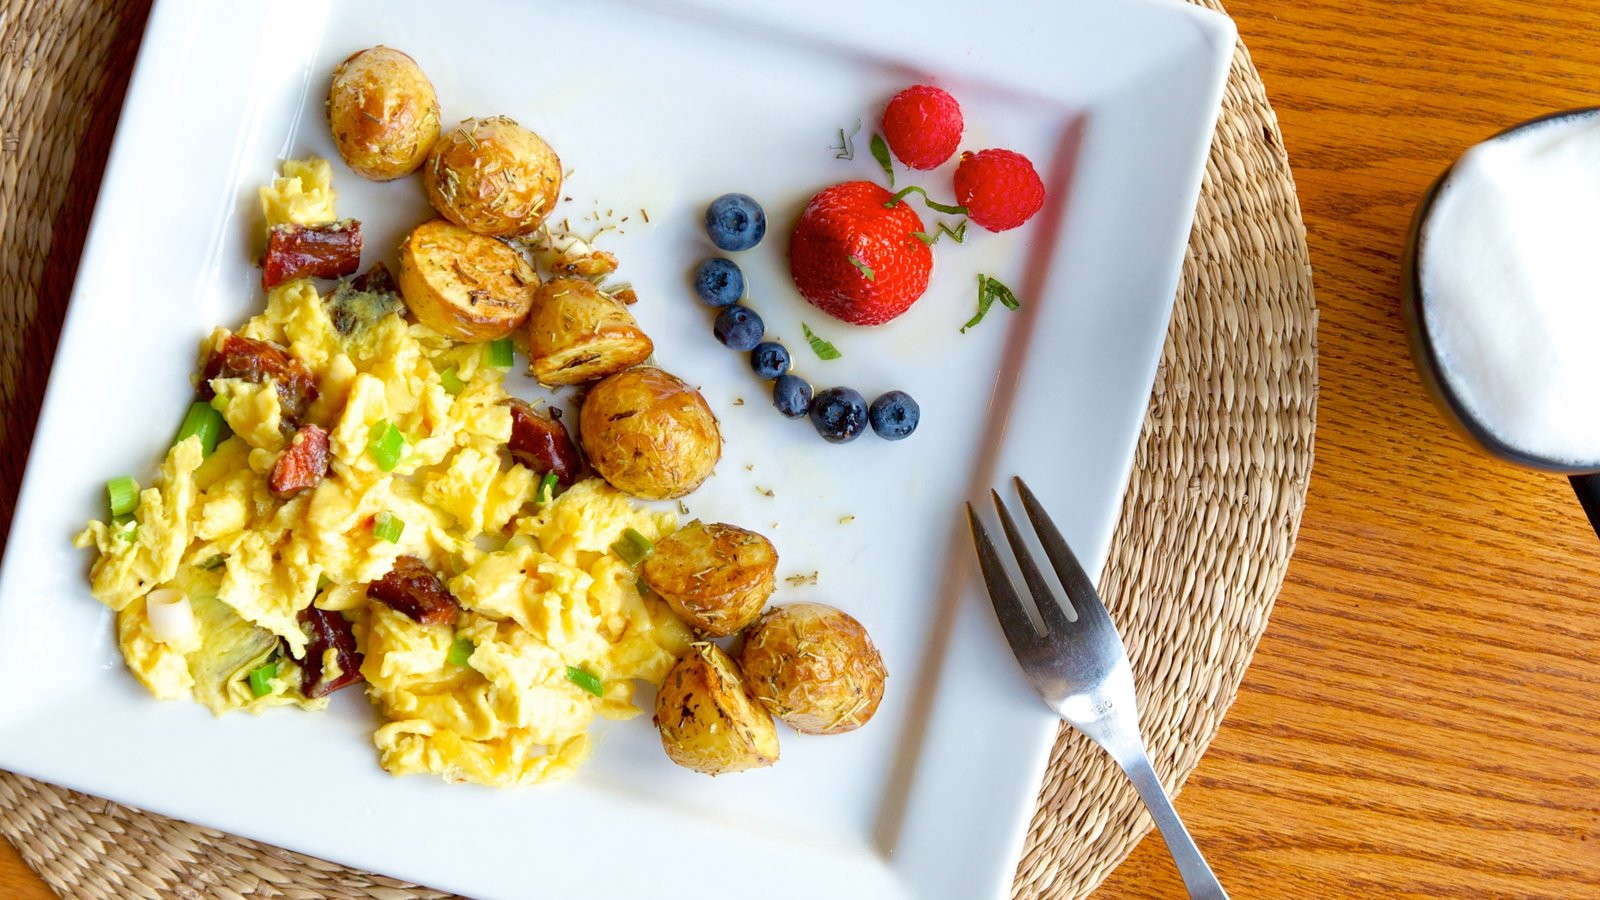 Castlegar which includes food